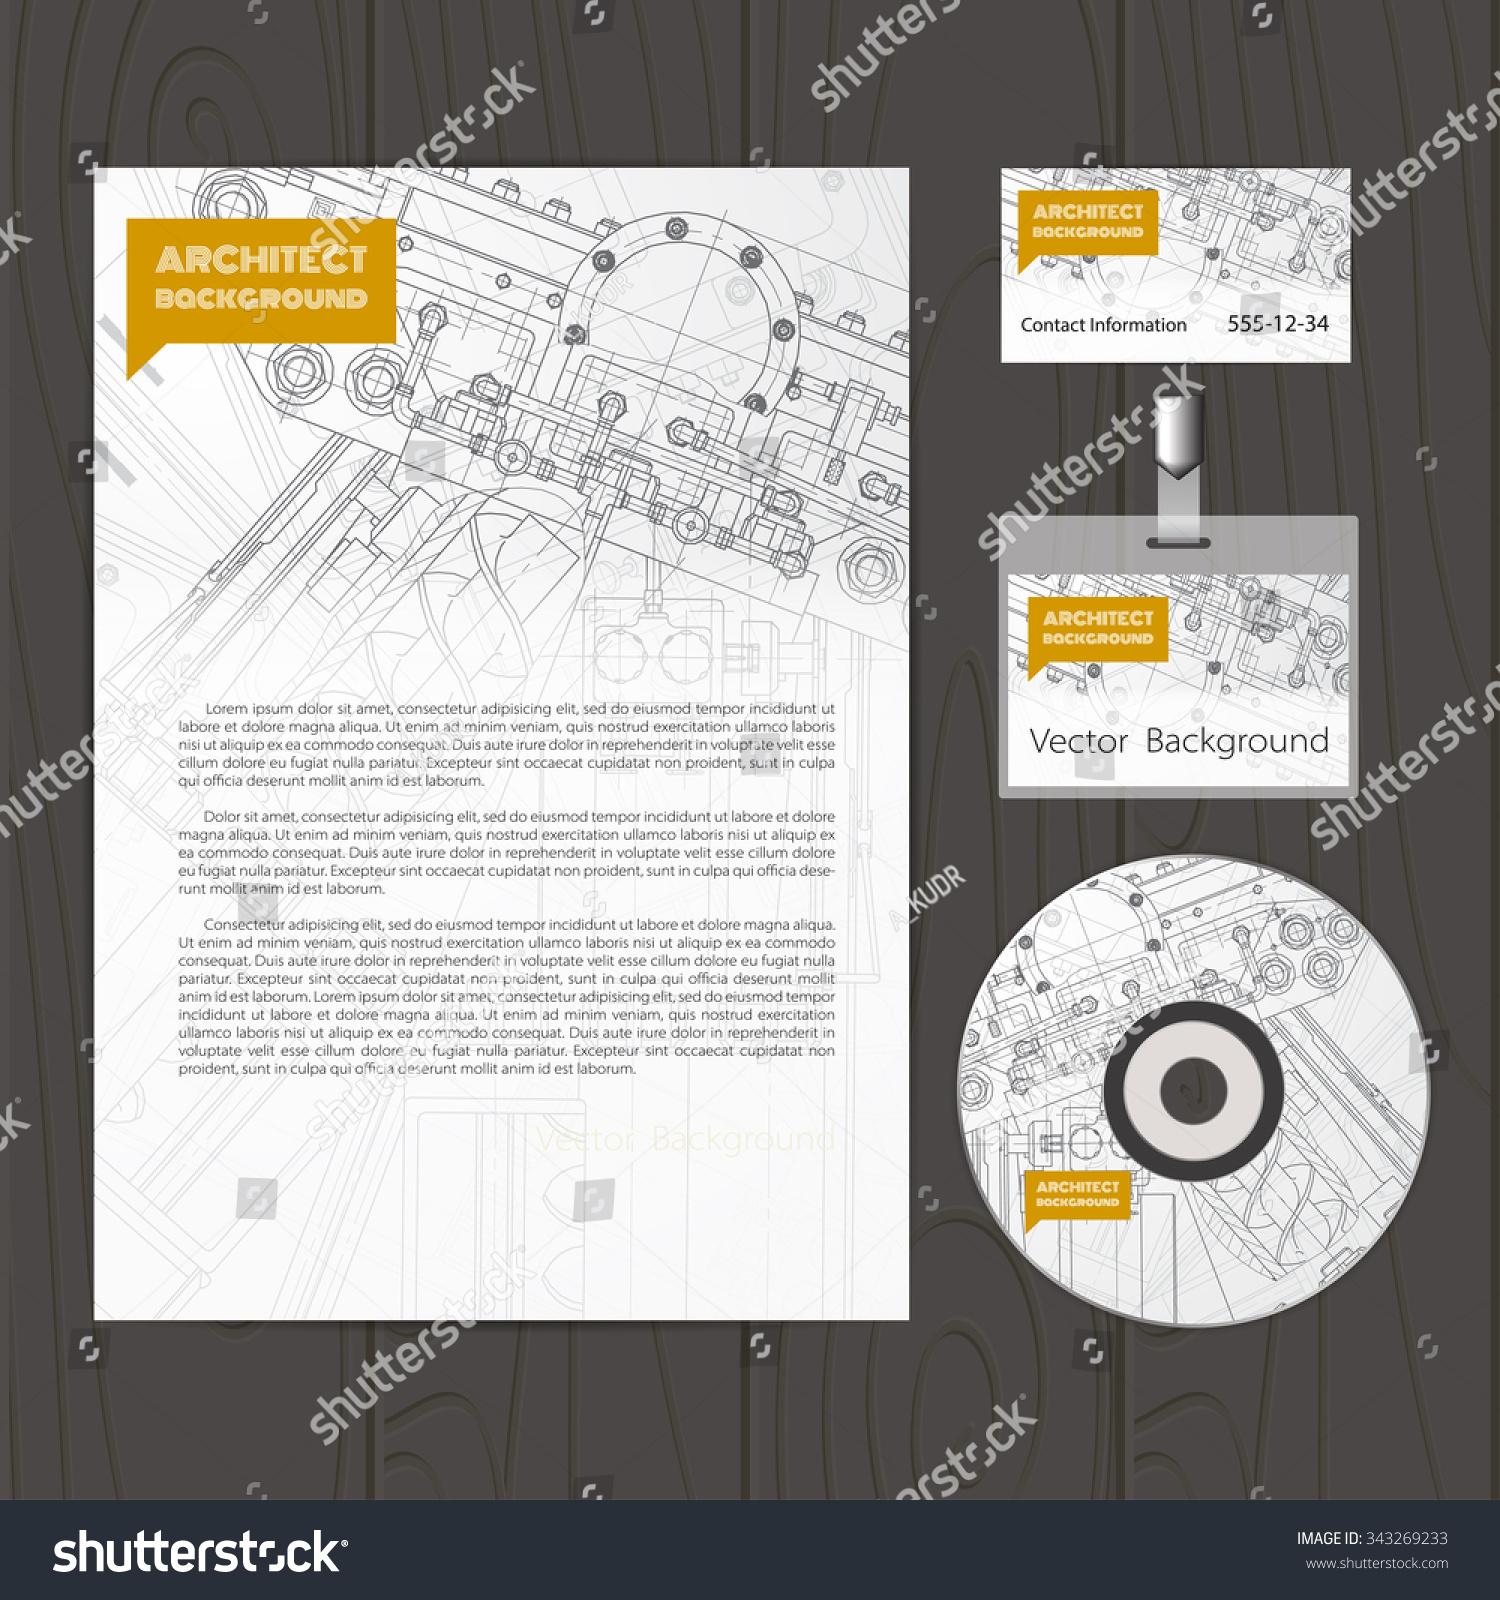 Vector technical blueprint mechanism engineer illustration stock vector technical blueprint of mechanism engineer illustration set of corporate identity templates vector malvernweather Gallery